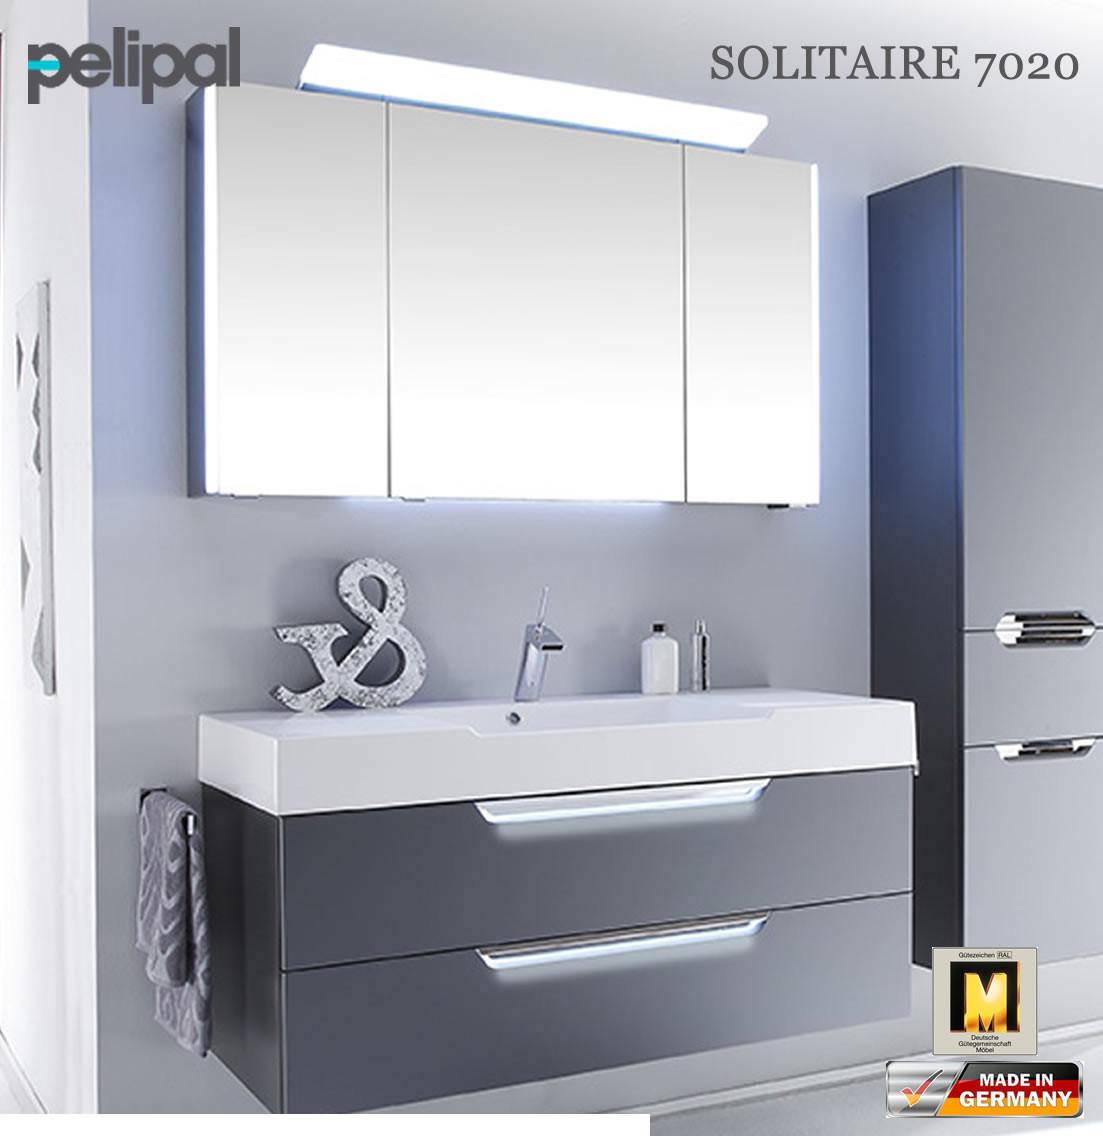 Badmöbel Pelipal  Pelipal Solitaire 7020 Badmöbel Set mit 1200 mm Waschtisch